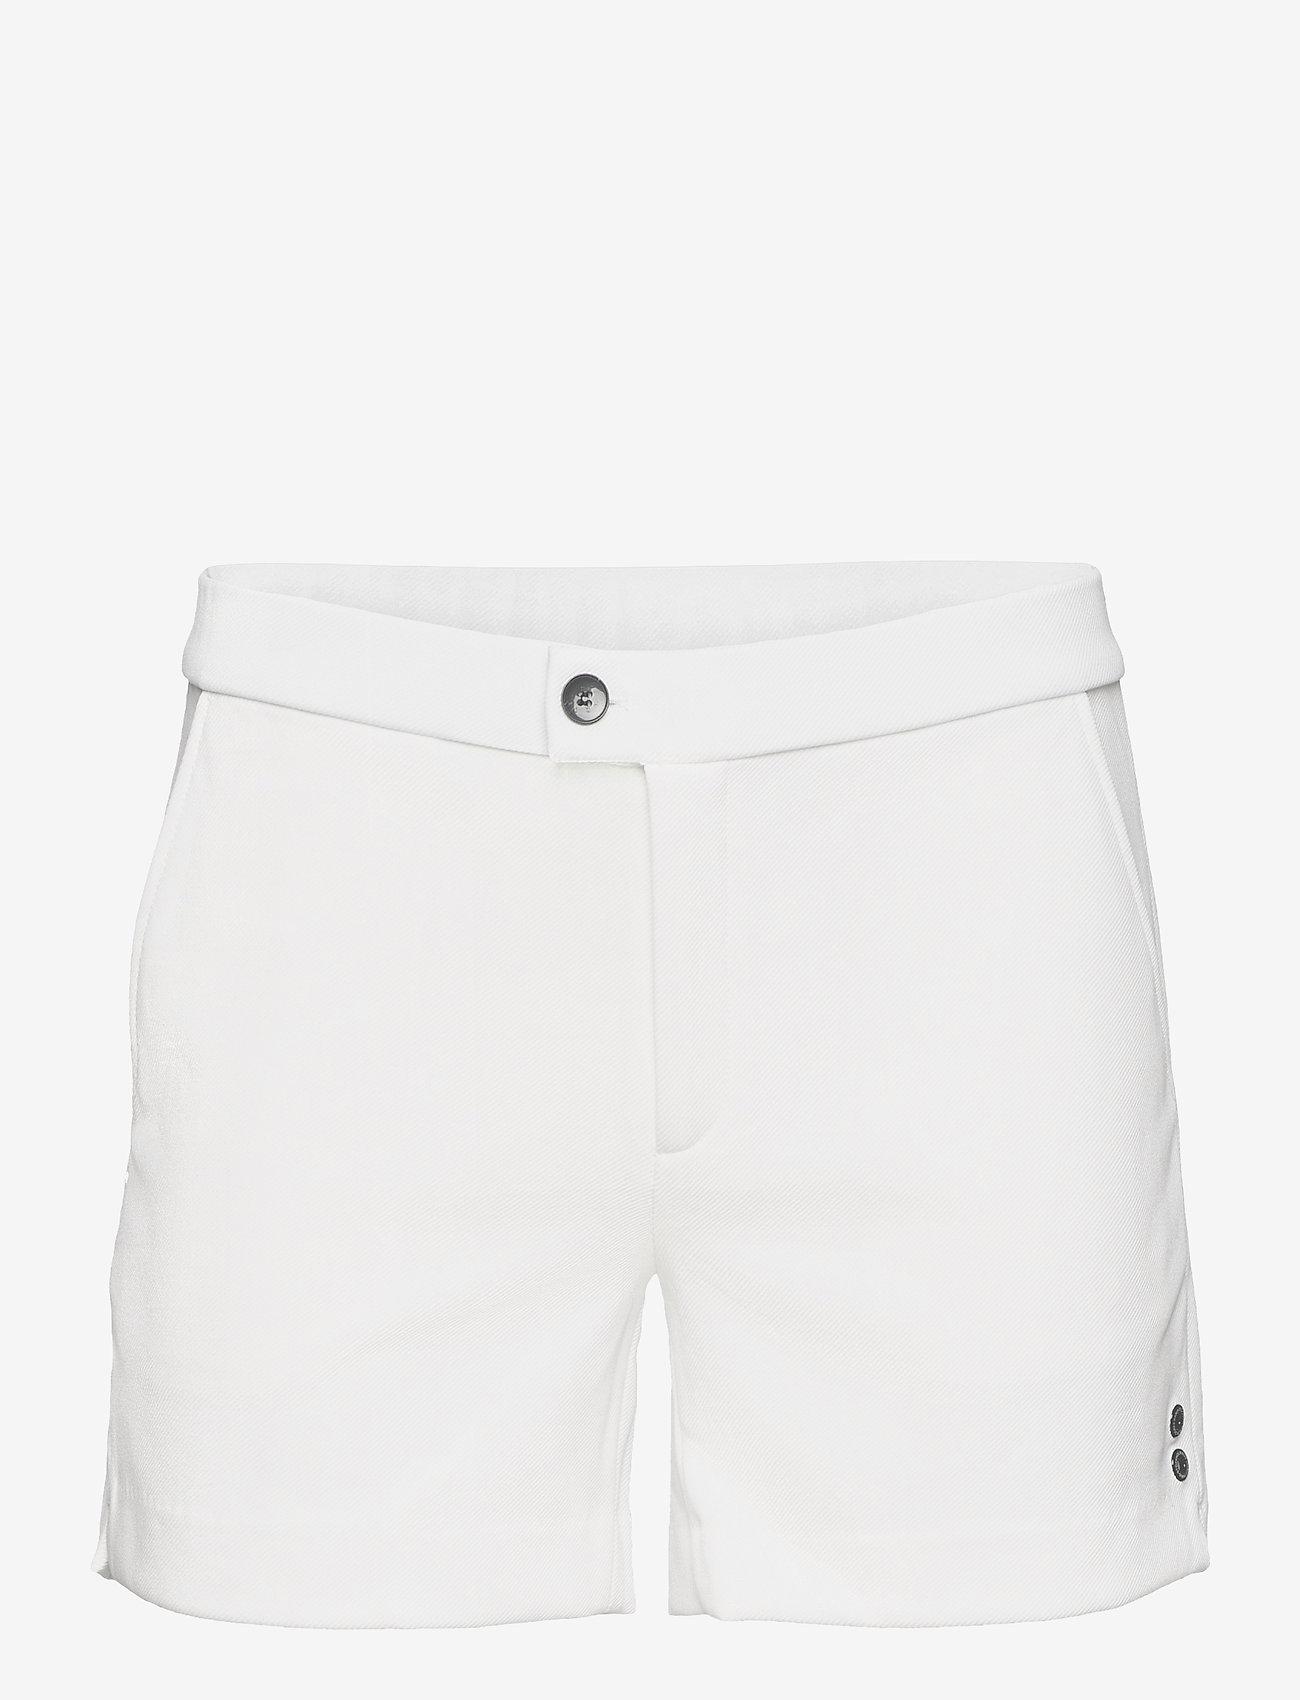 Ron Dorff - TENNIS SHORTS - training korte broek - white - 0